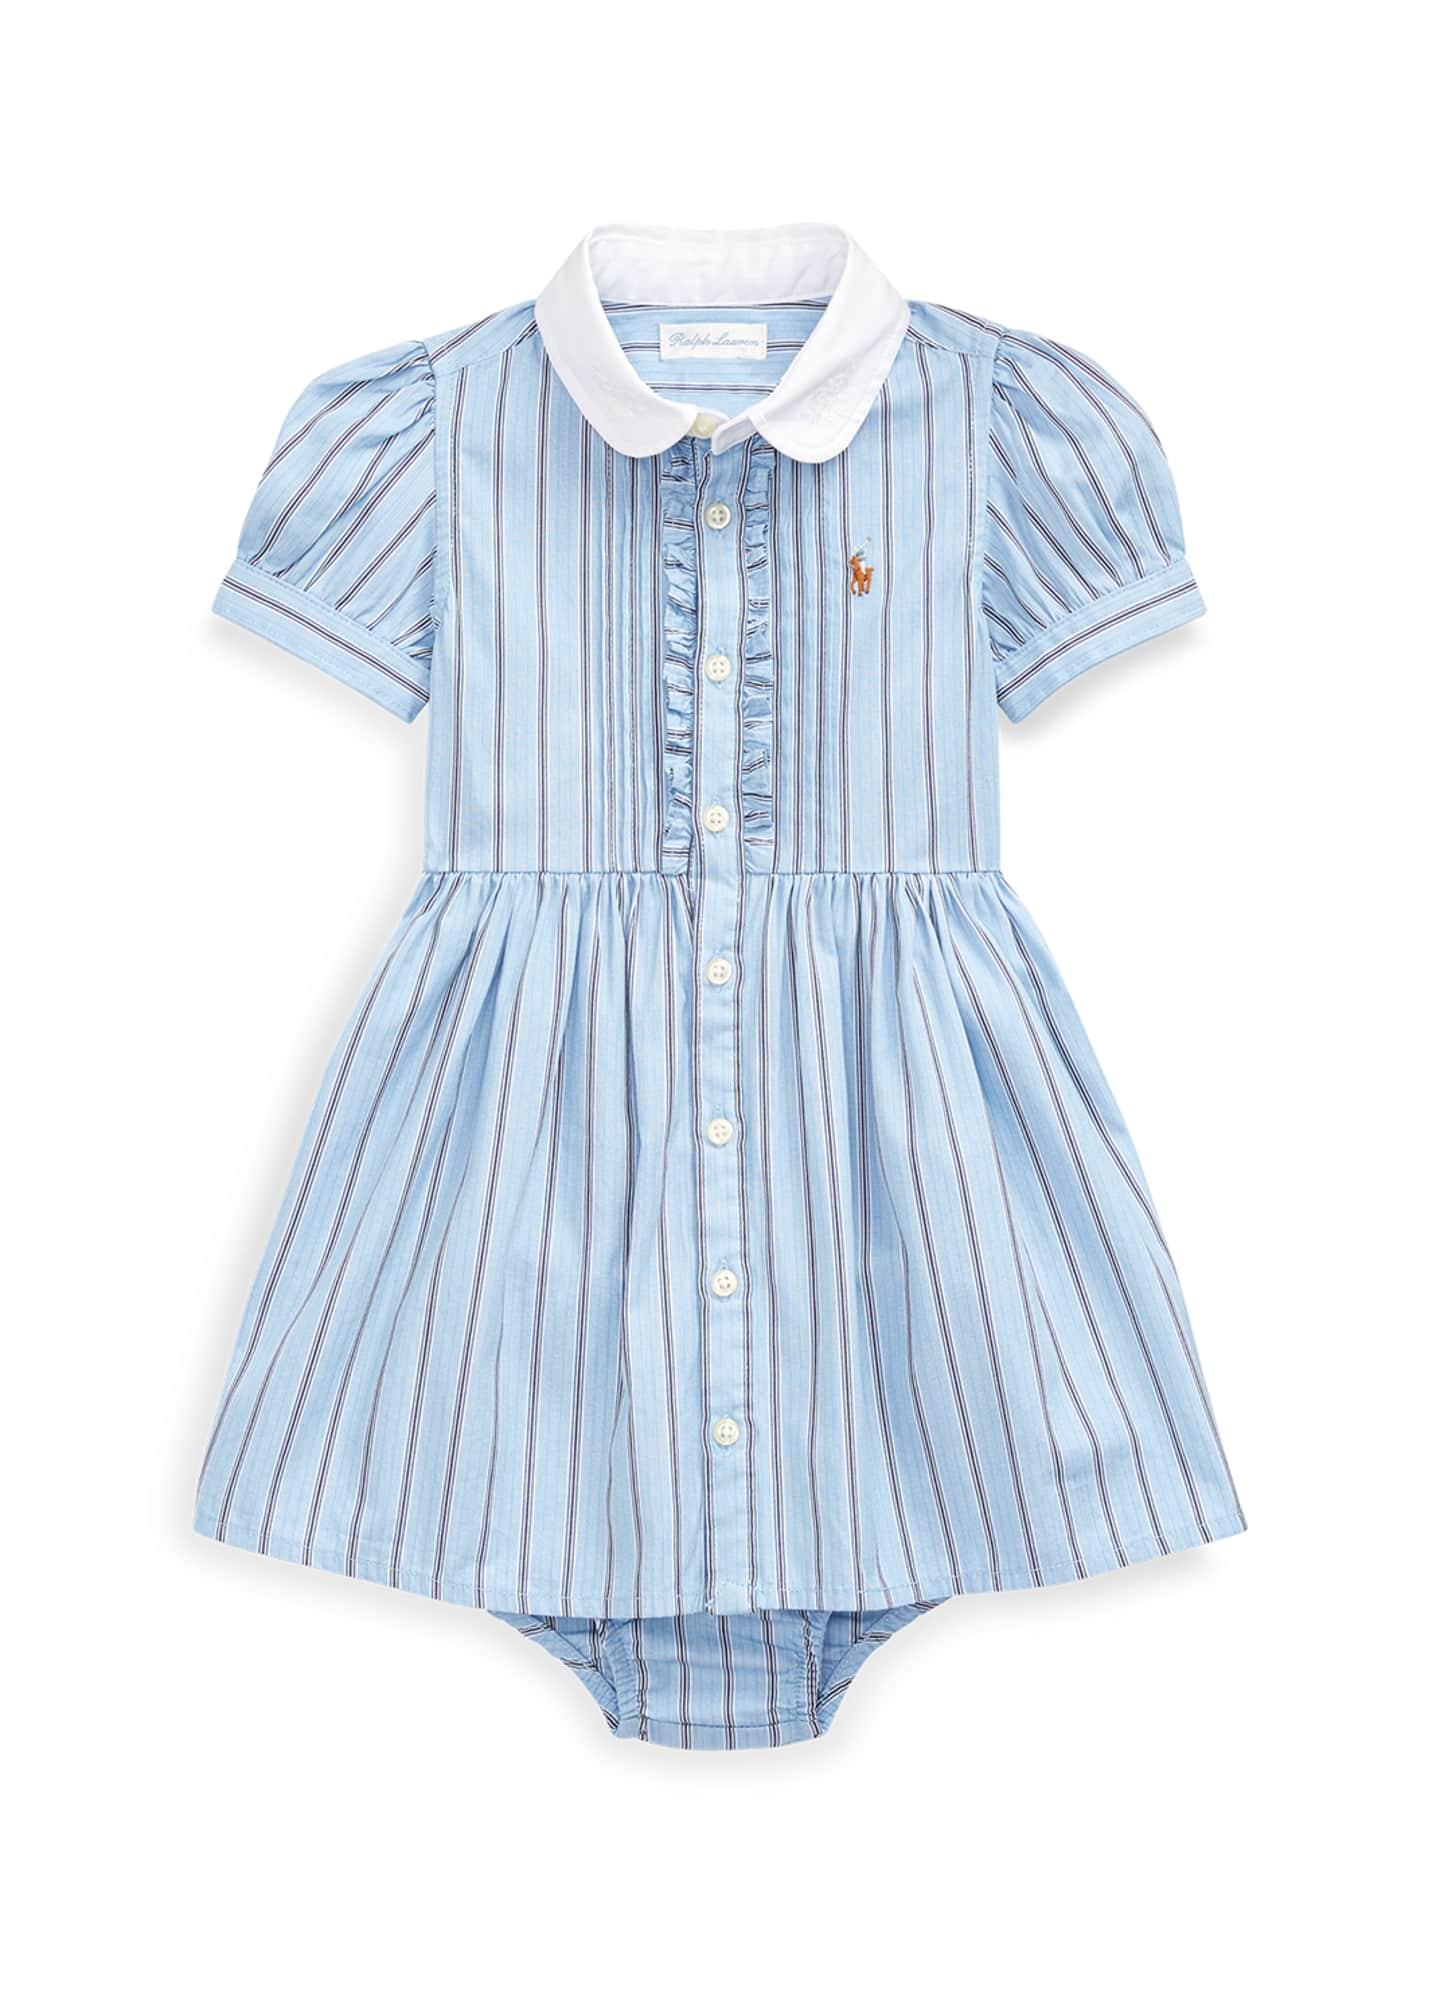 Ralph Lauren Childrenswear Striped Button-Up Dress w/ Bloomers,